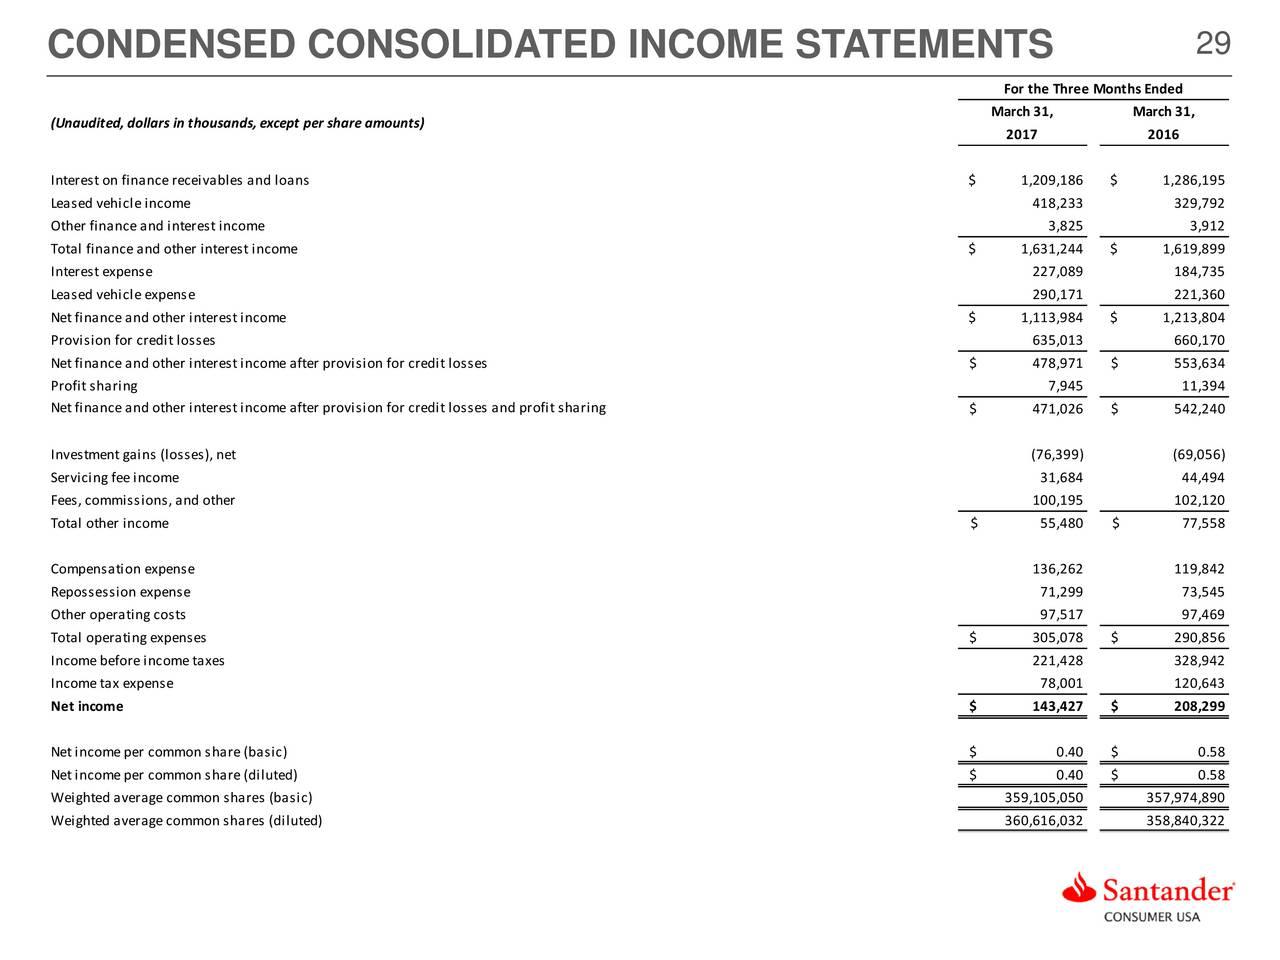 santander consumer usa holdings inc 2017 q1